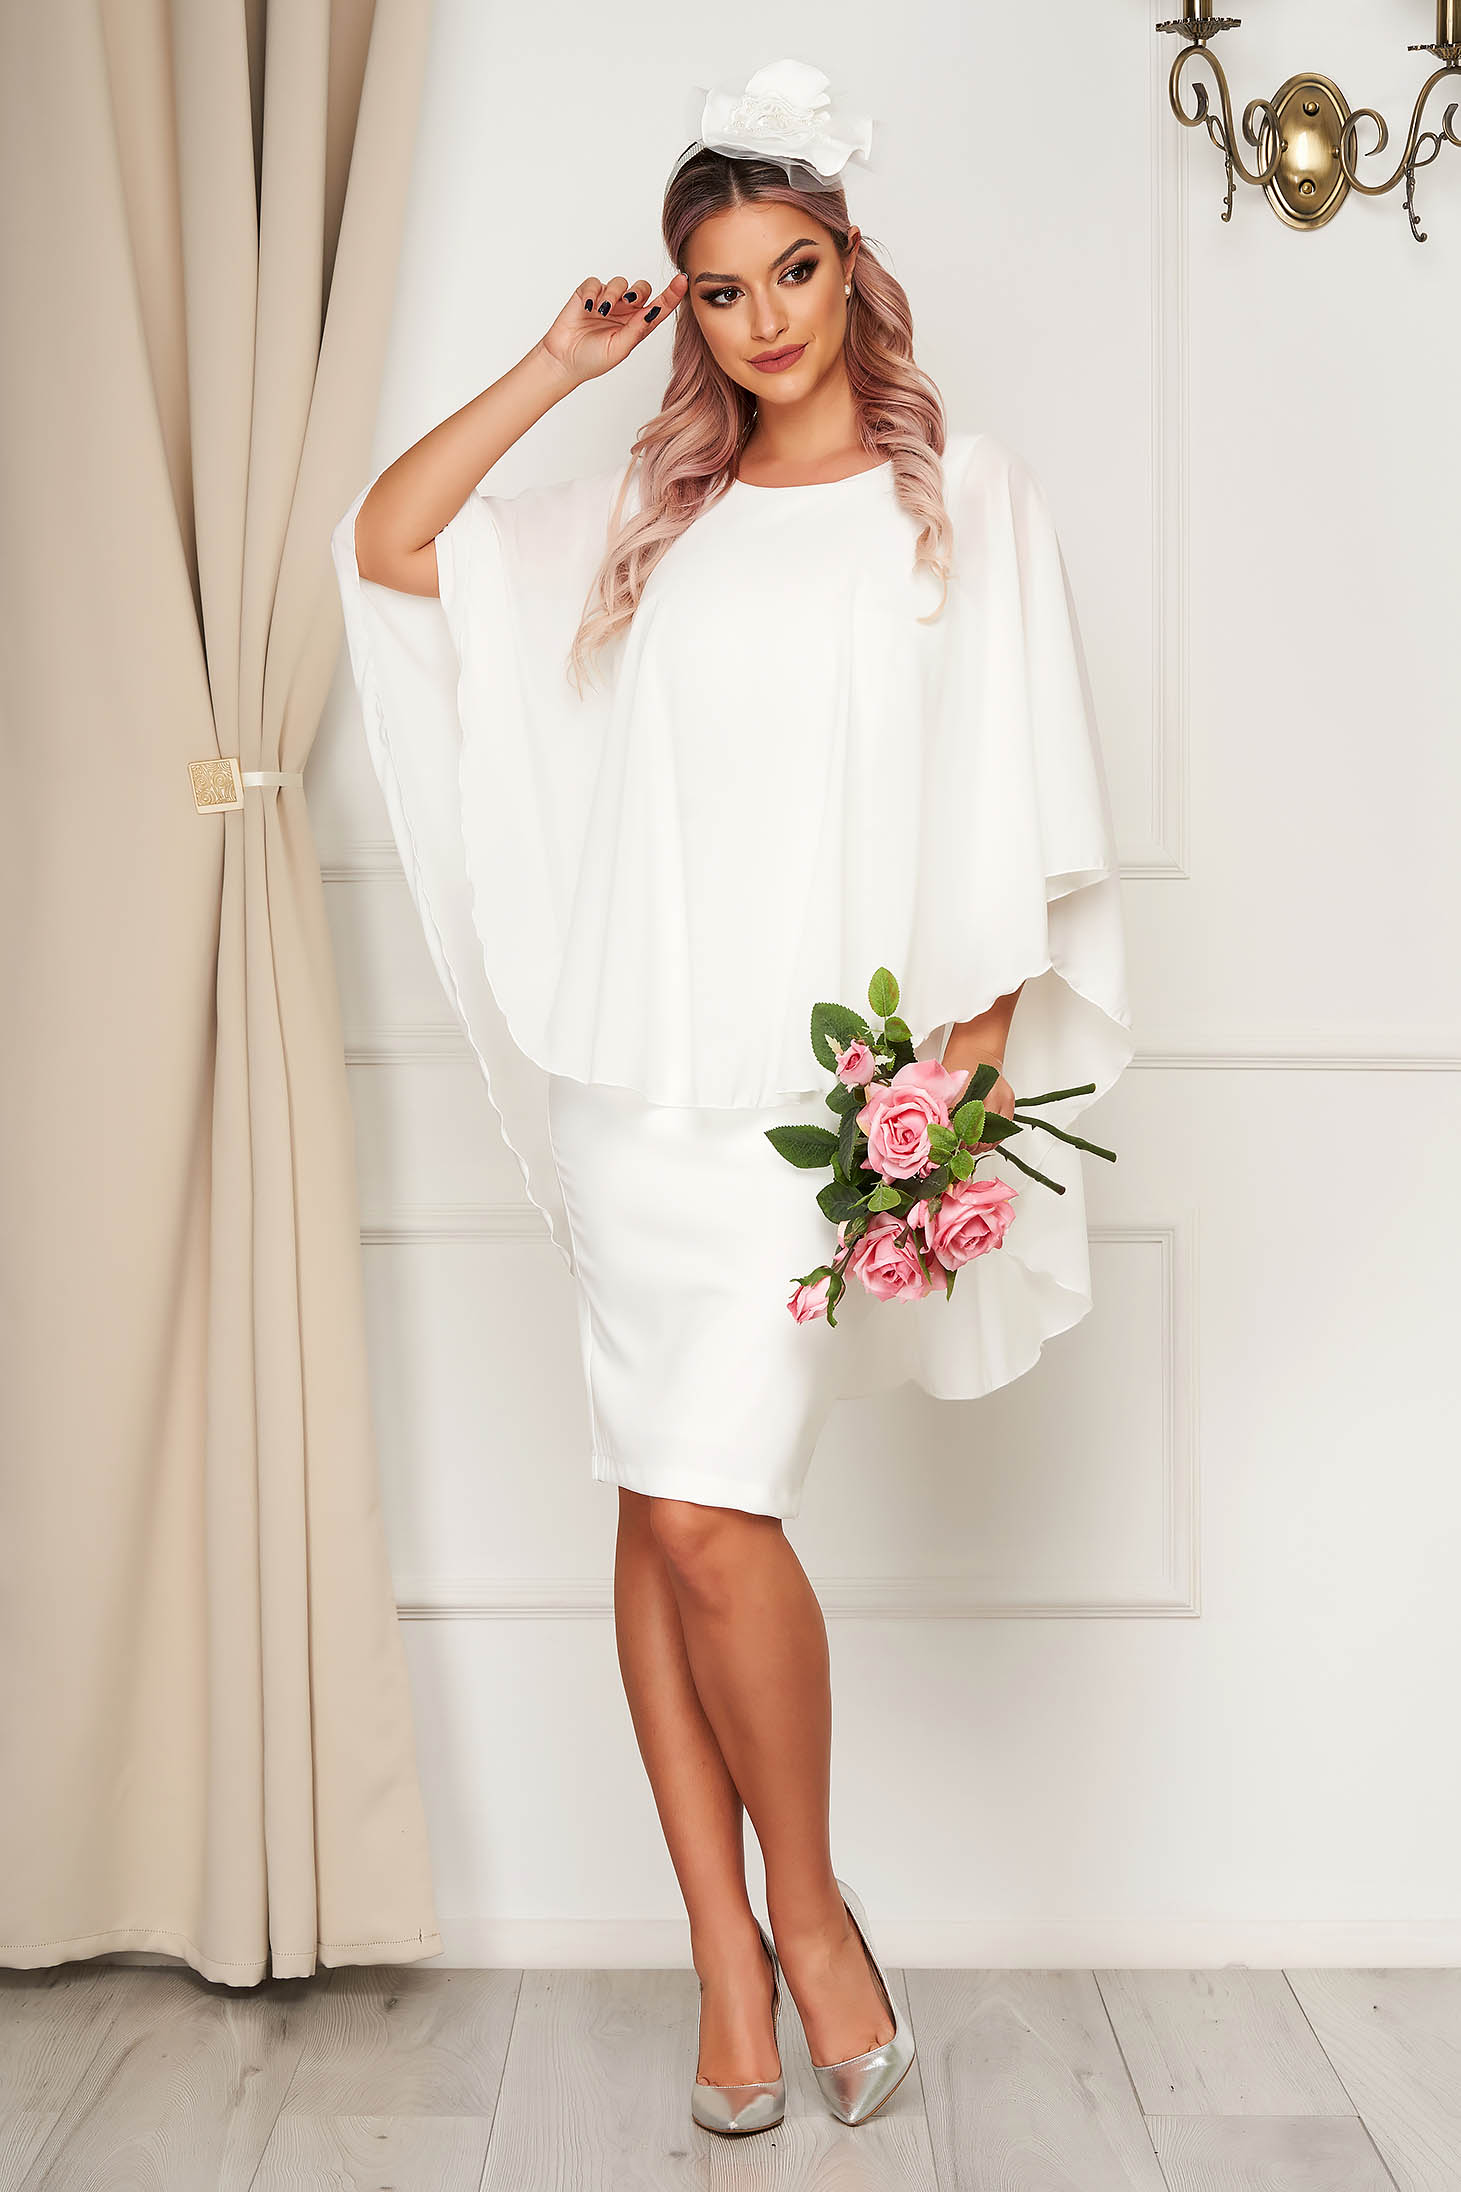 Dress StarShinerS white midi pencil cloth elegant voile overlay